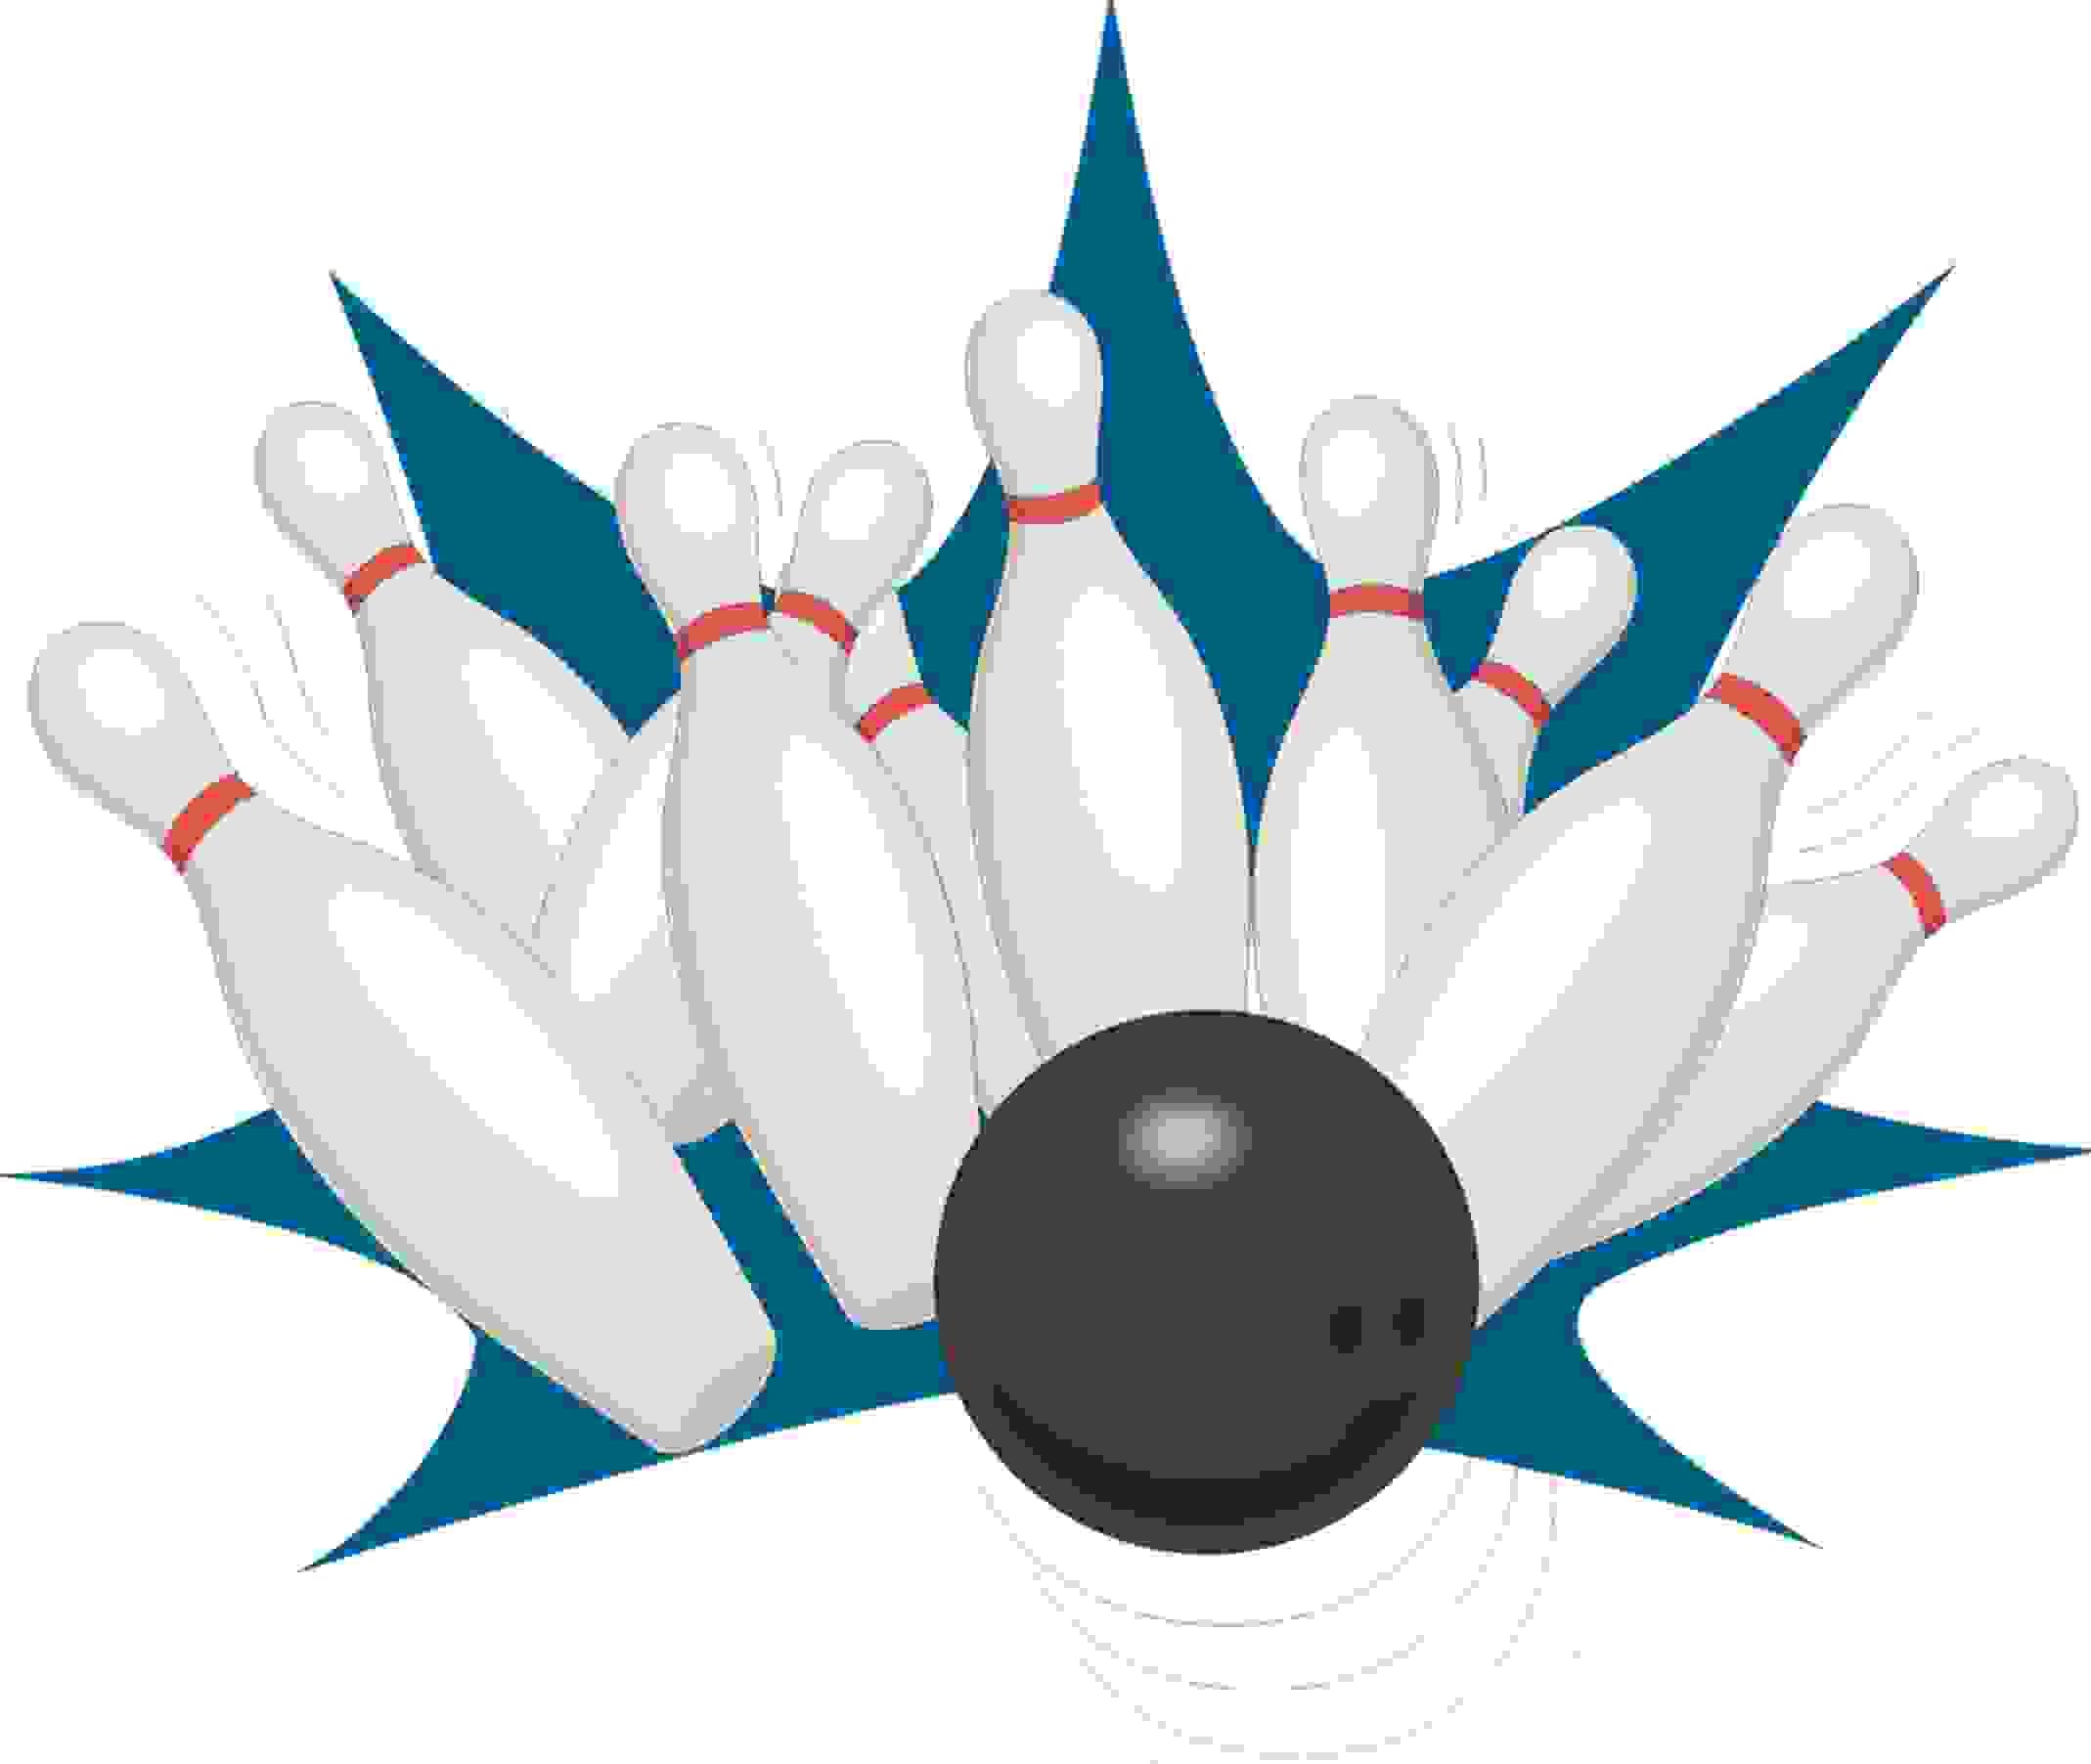 2138x1804 Kegel Bowling Clipart